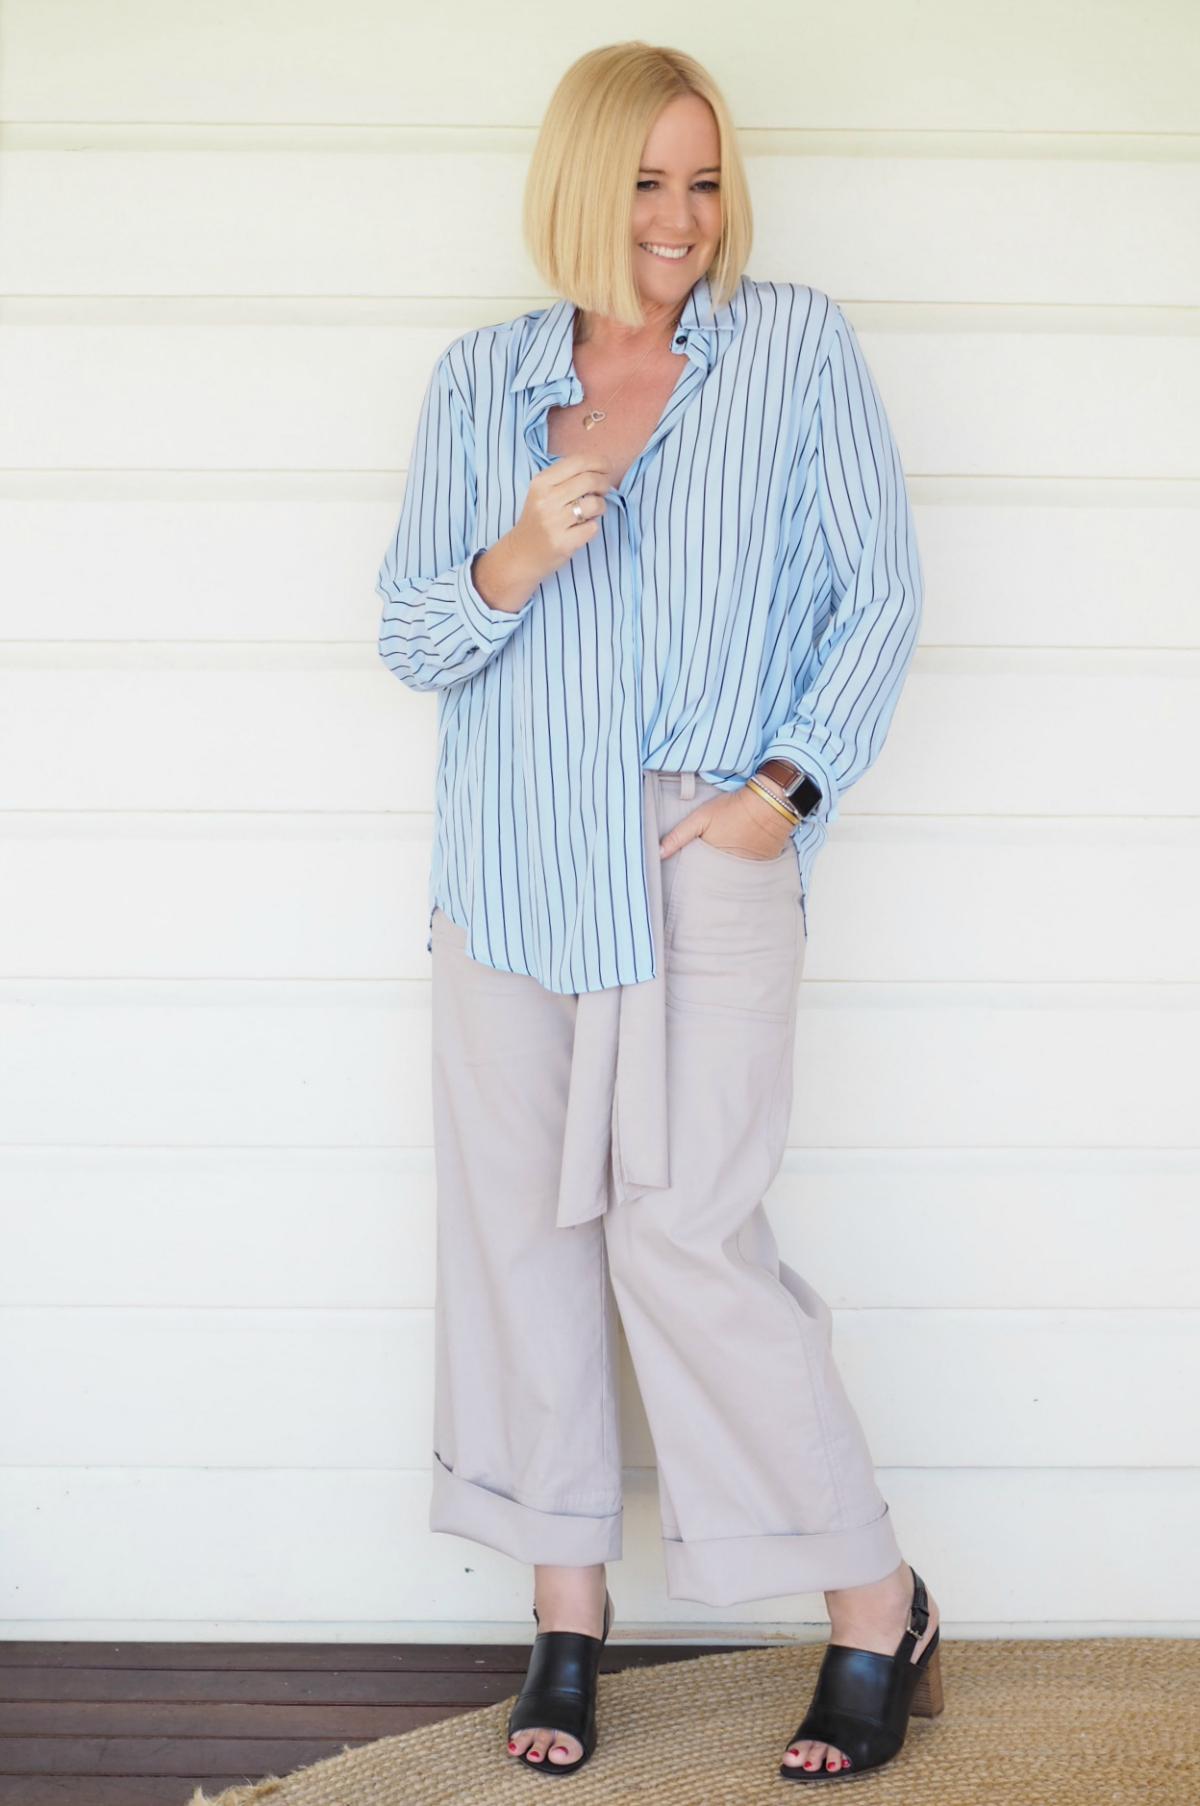 Mela Purdie shirt and pant; FRANKiE4 Footwear Cate mule | spring-summer 2017 | Zambezee Boutique